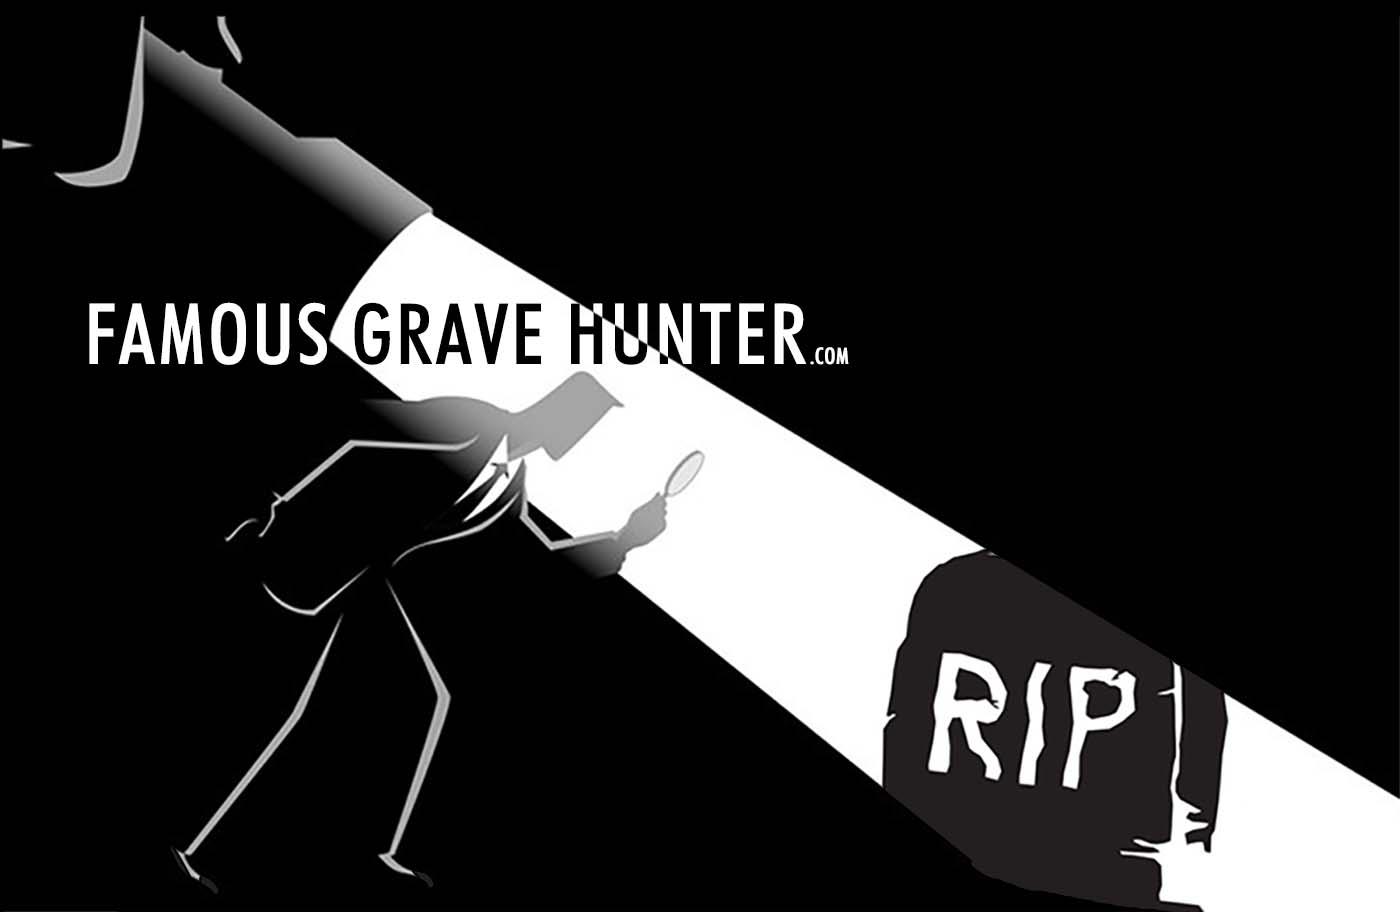 Famous Celebrity, Infamous Grave Photos and Locations - Famous Grave Hunter